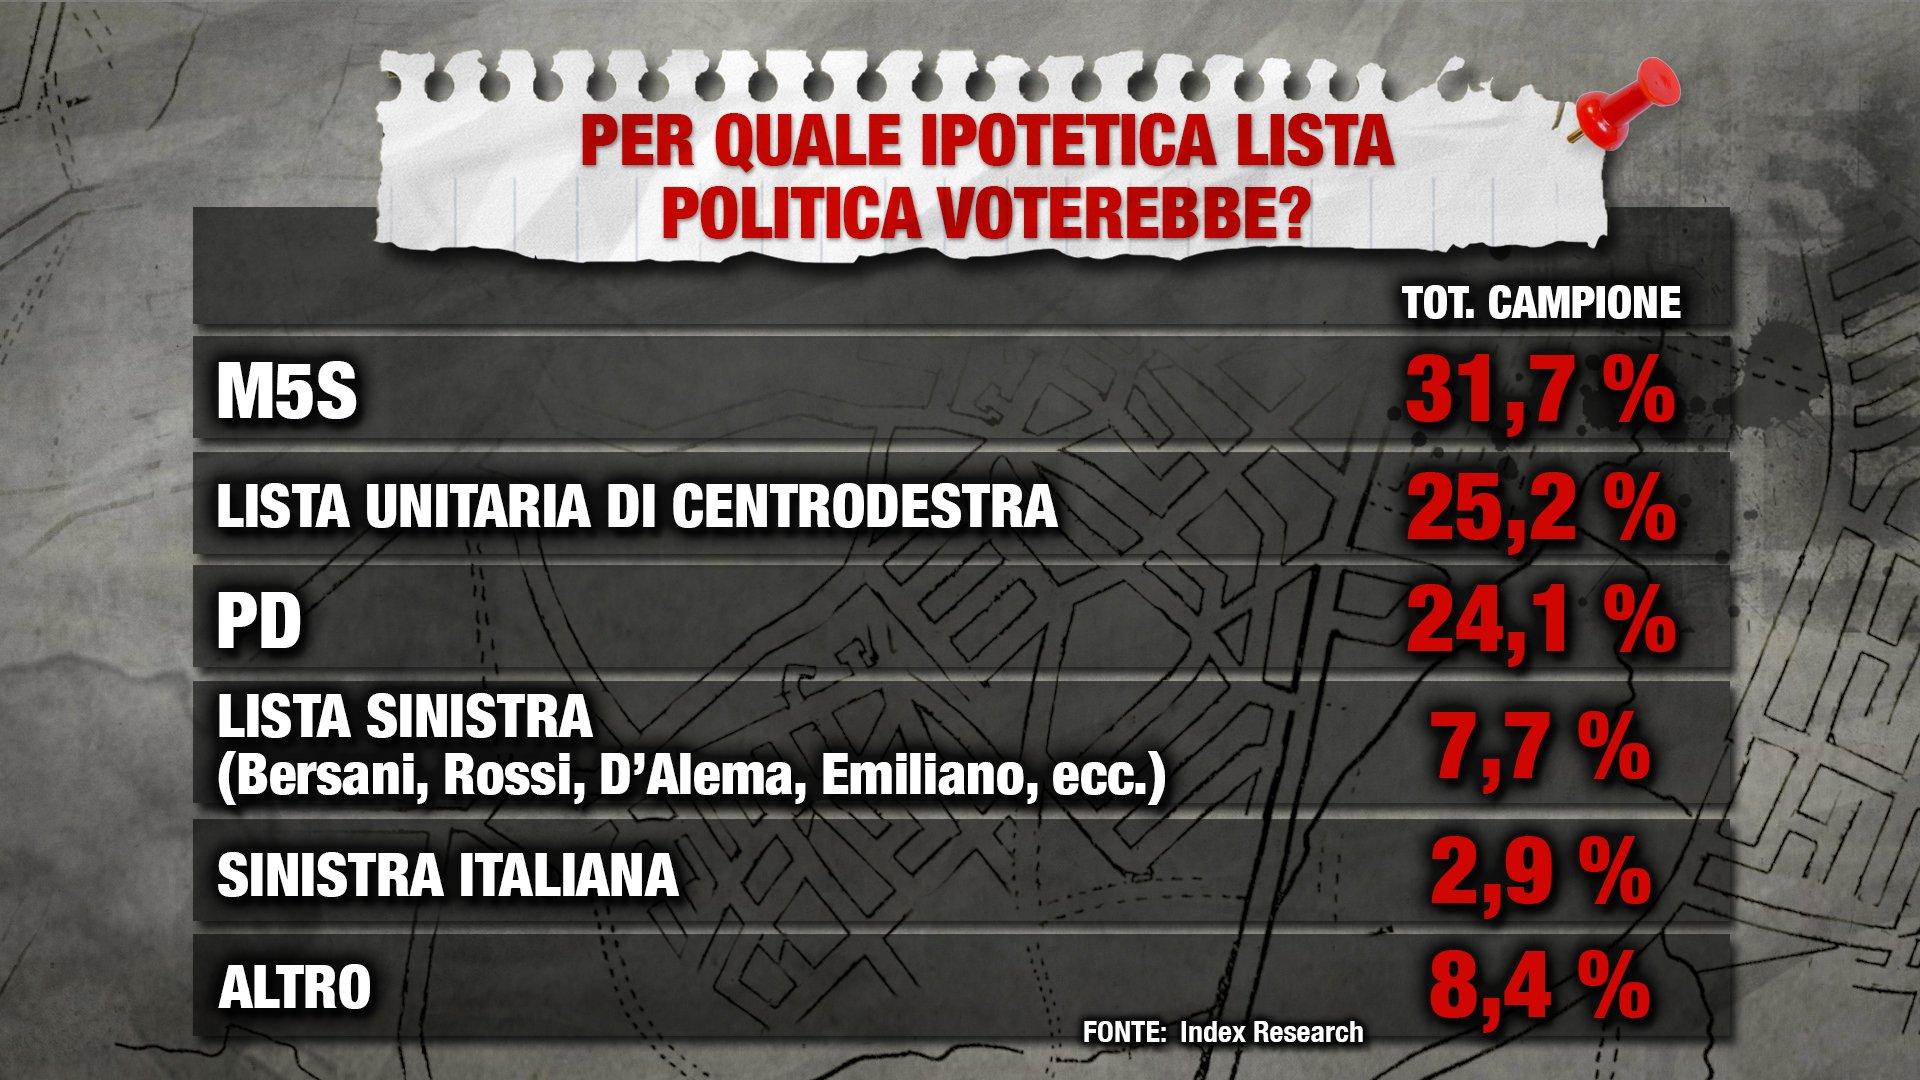 Sondaggio Index Research: Lista D'Alema al 7,7%